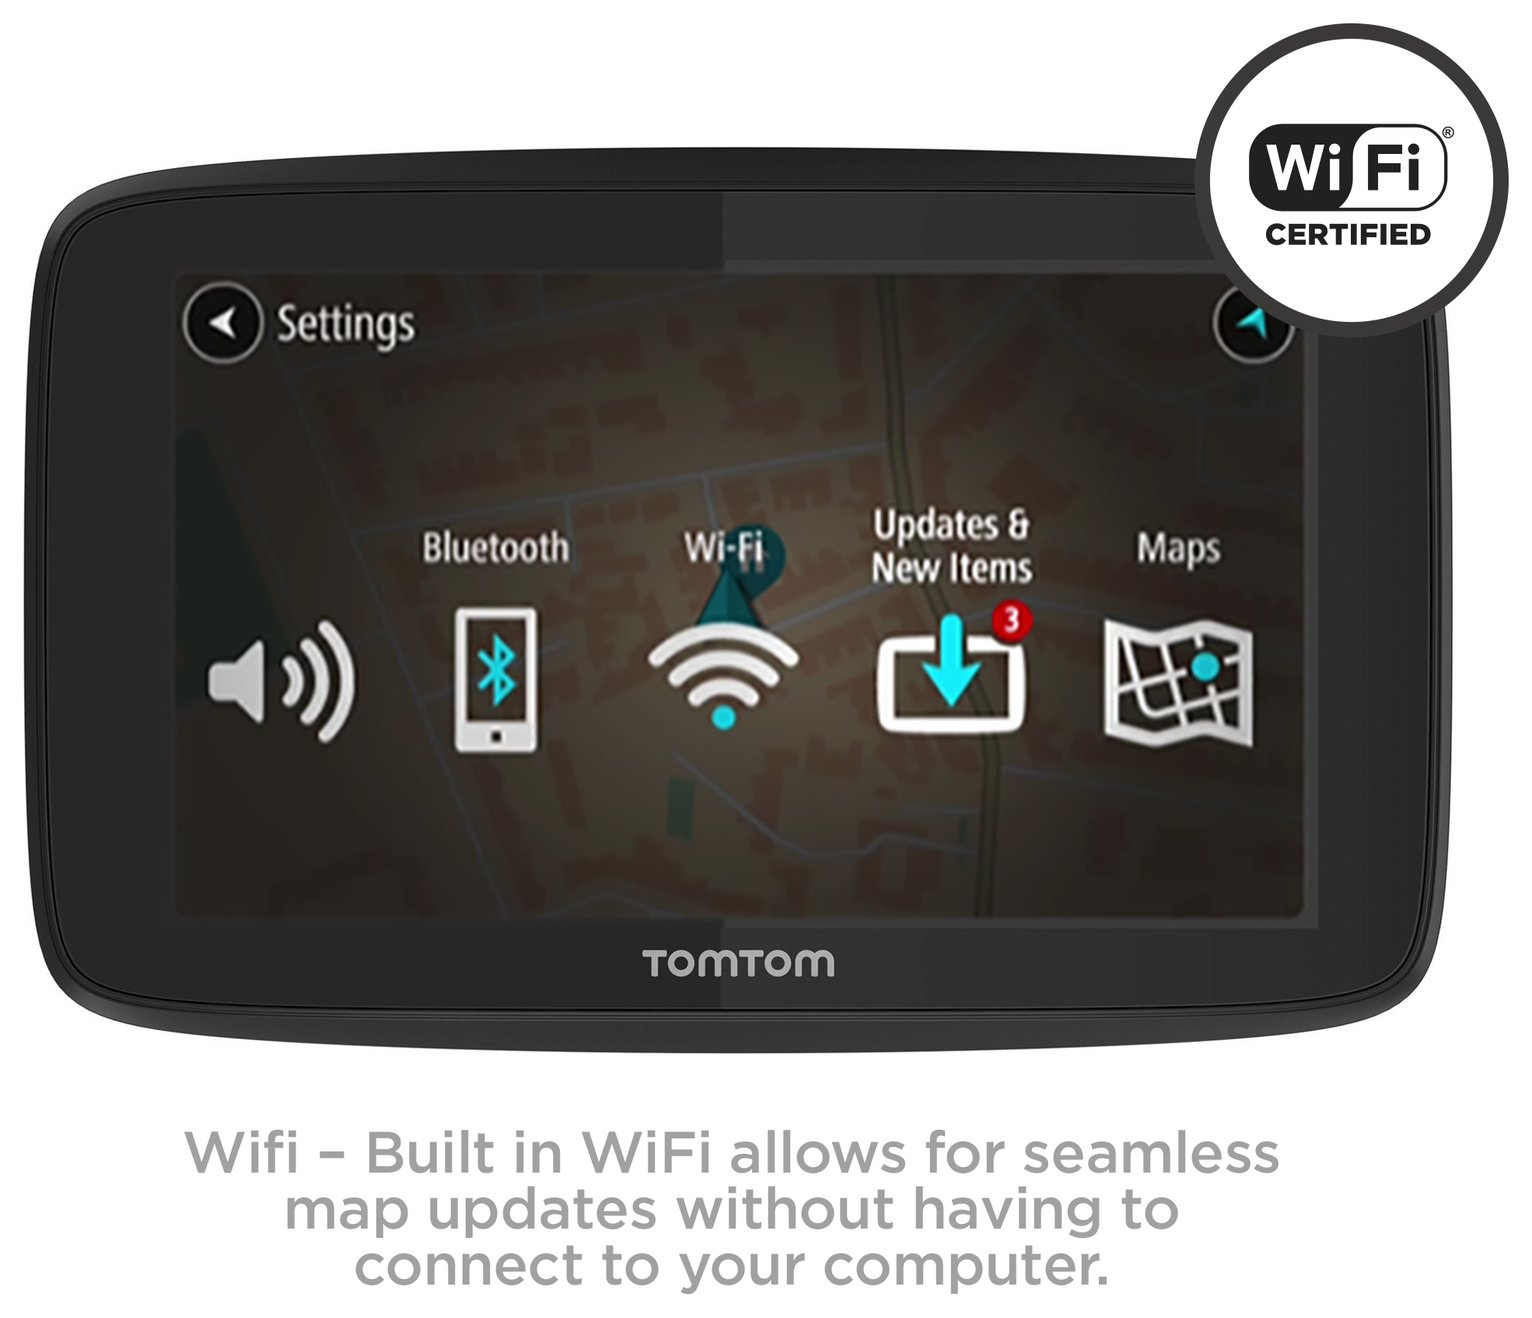 TomTom GO 5200 Sat Nav with World Maps, Traffic & WiFi